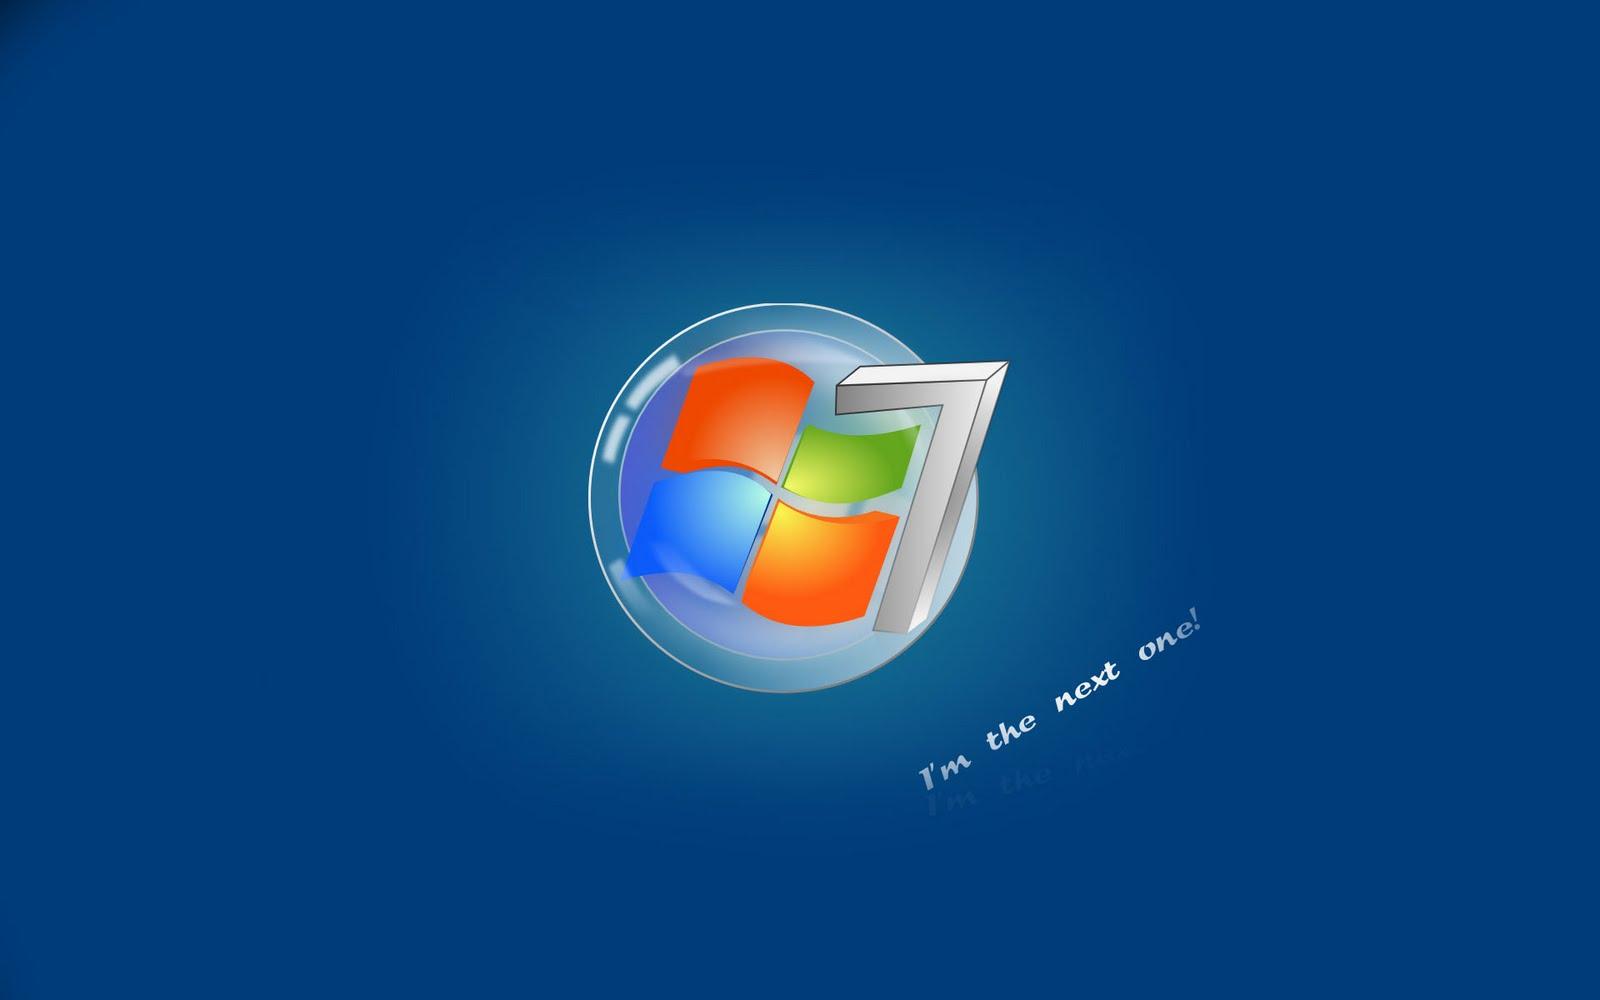 http://1.bp.blogspot.com/_6uA6OFi0qwo/TNCxY3Rv53I/AAAAAAAABTc/KW8q-BK6NUc/s1600/Windows%2525252B7%2525252Bultimate%2525252Bcollection%2525252Bof%2525252Bwallpapers.5.jpg